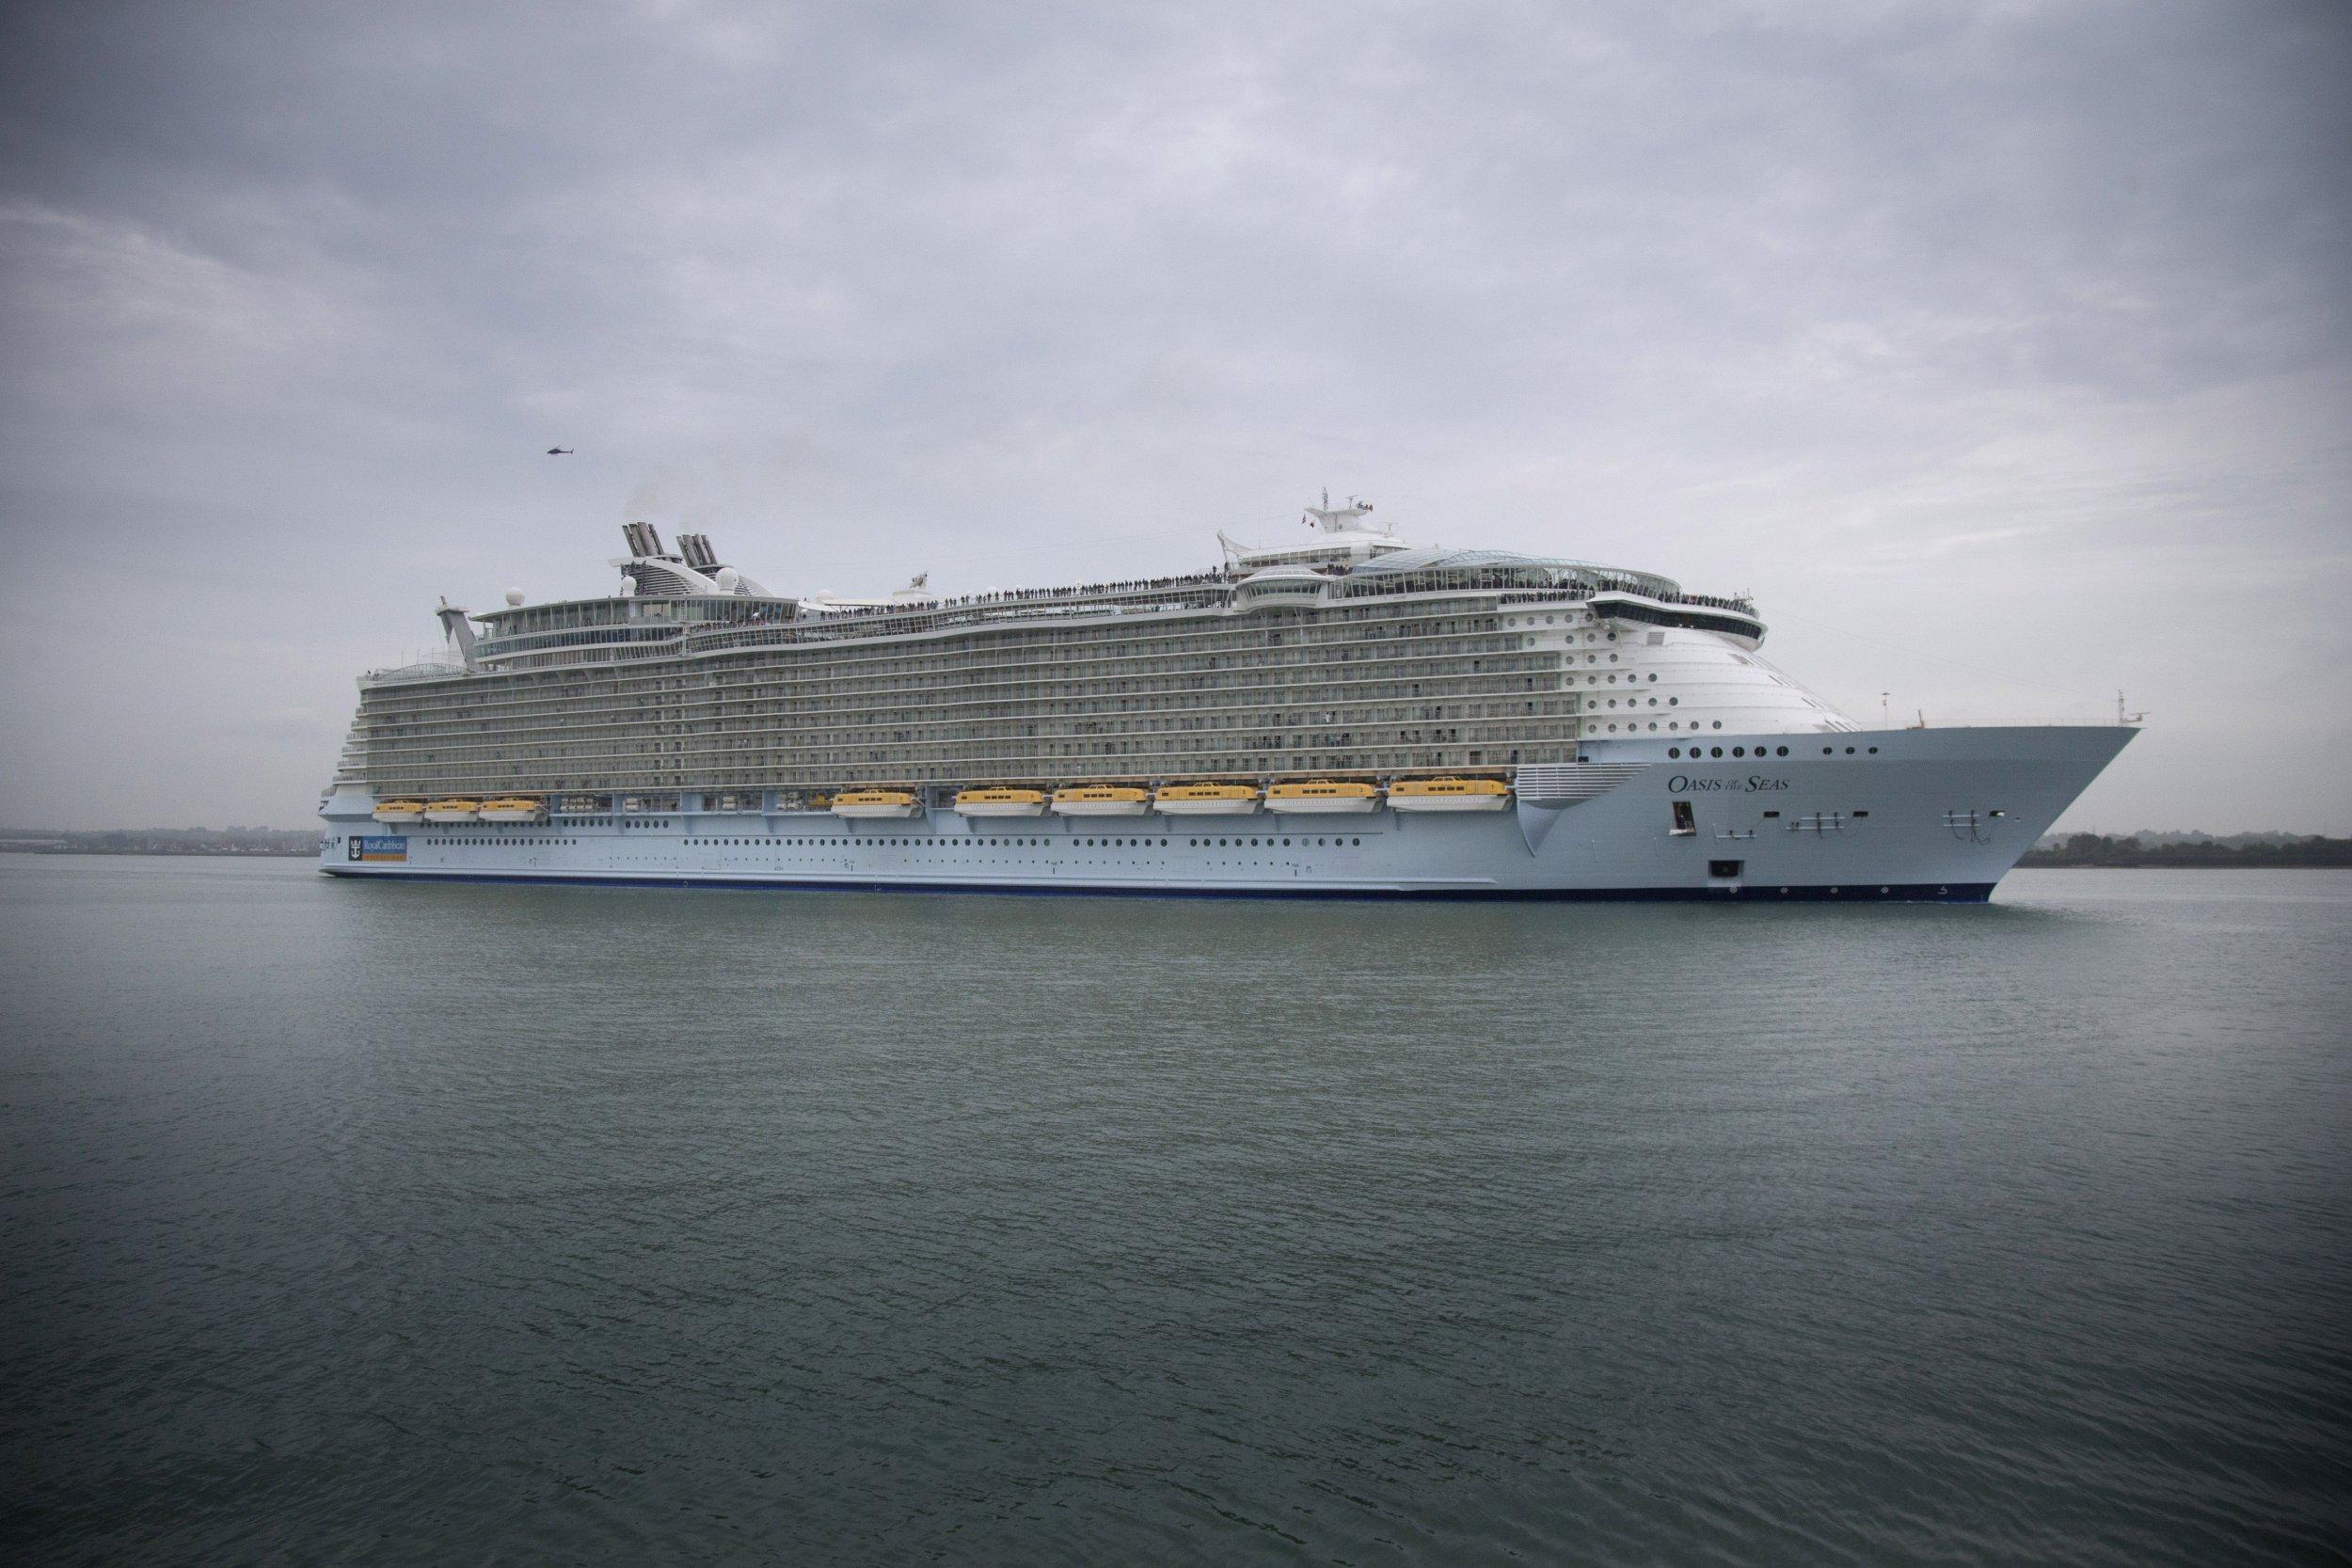 Cruise Ship, Norovirus, Gastrointestinal Illness, Oasis of the Seas, Royal Caribbean